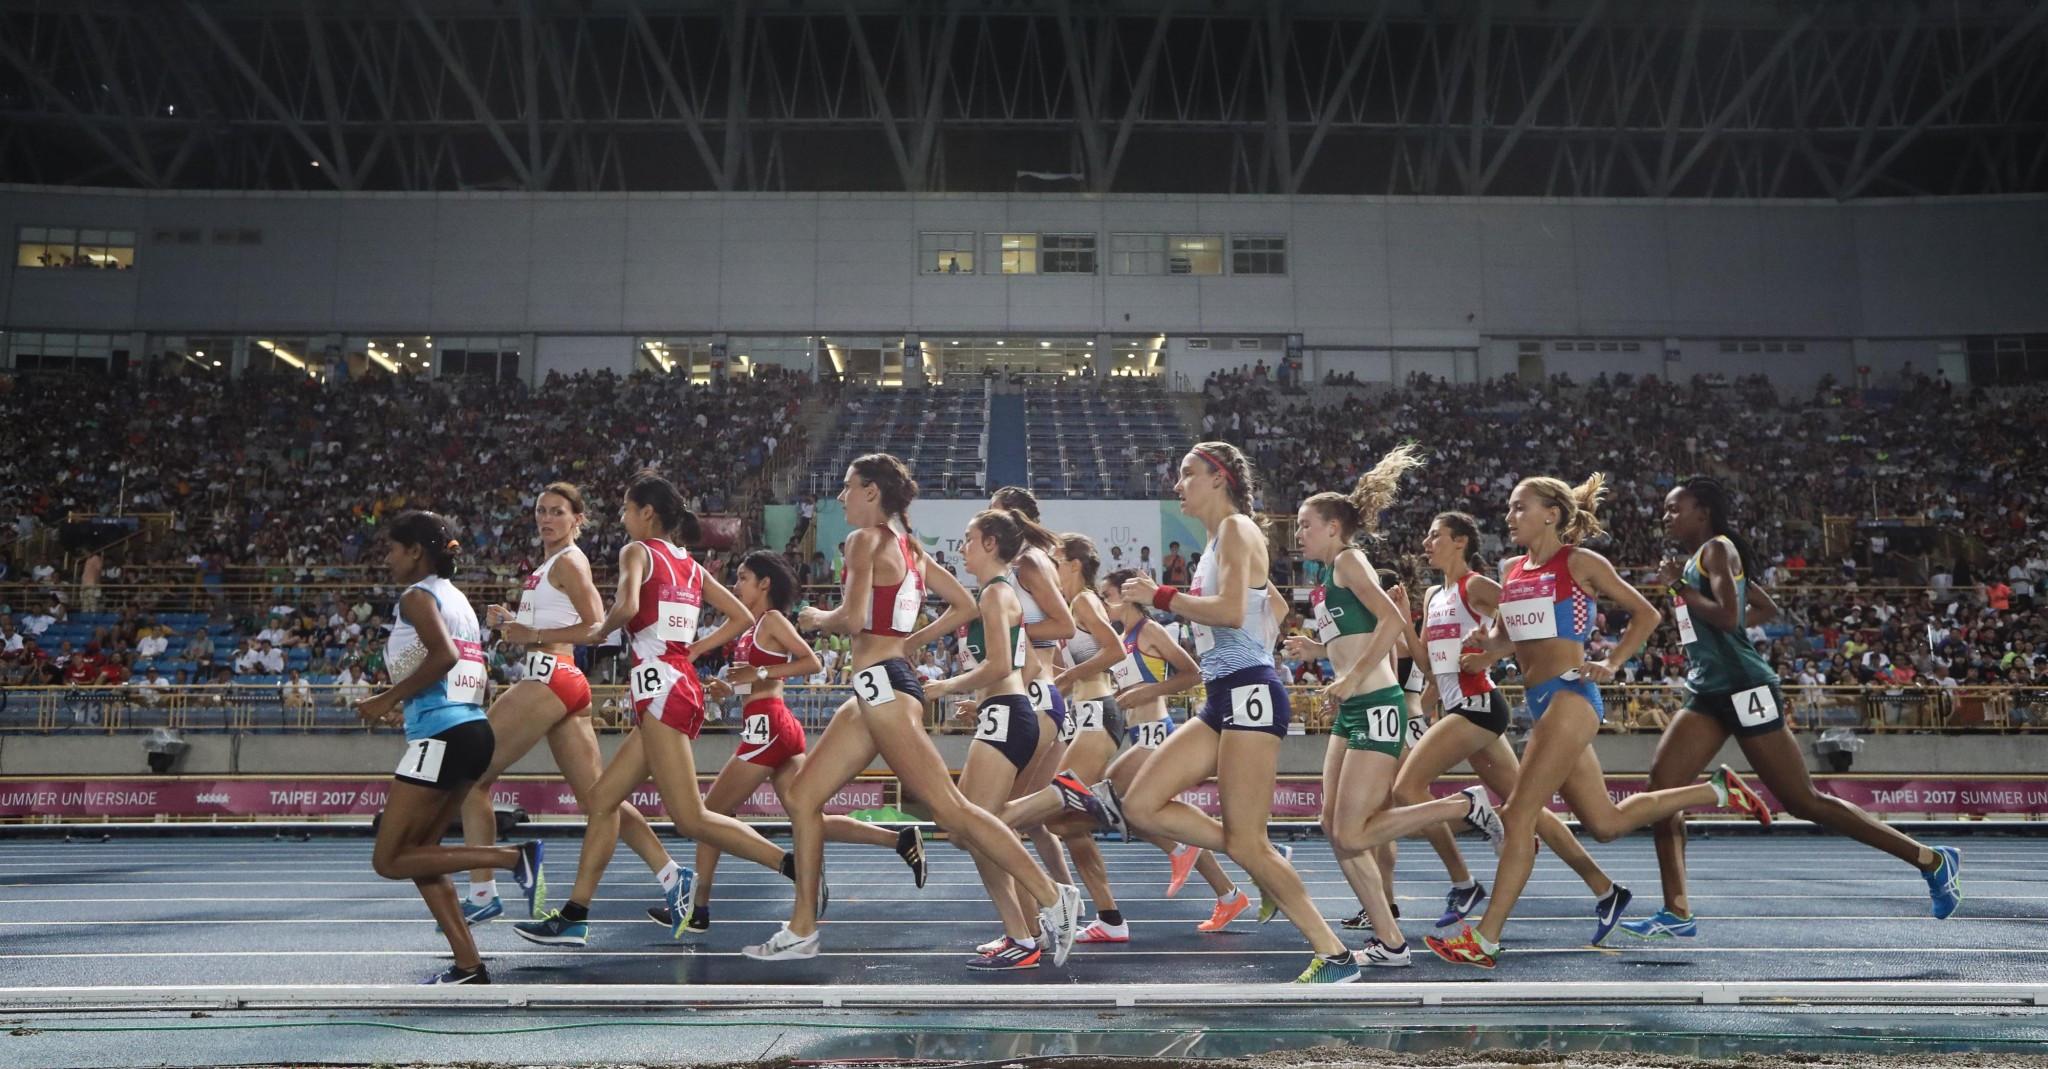 Germany's Hanna Klein won the women's 5,000m title ©Taipei 2017